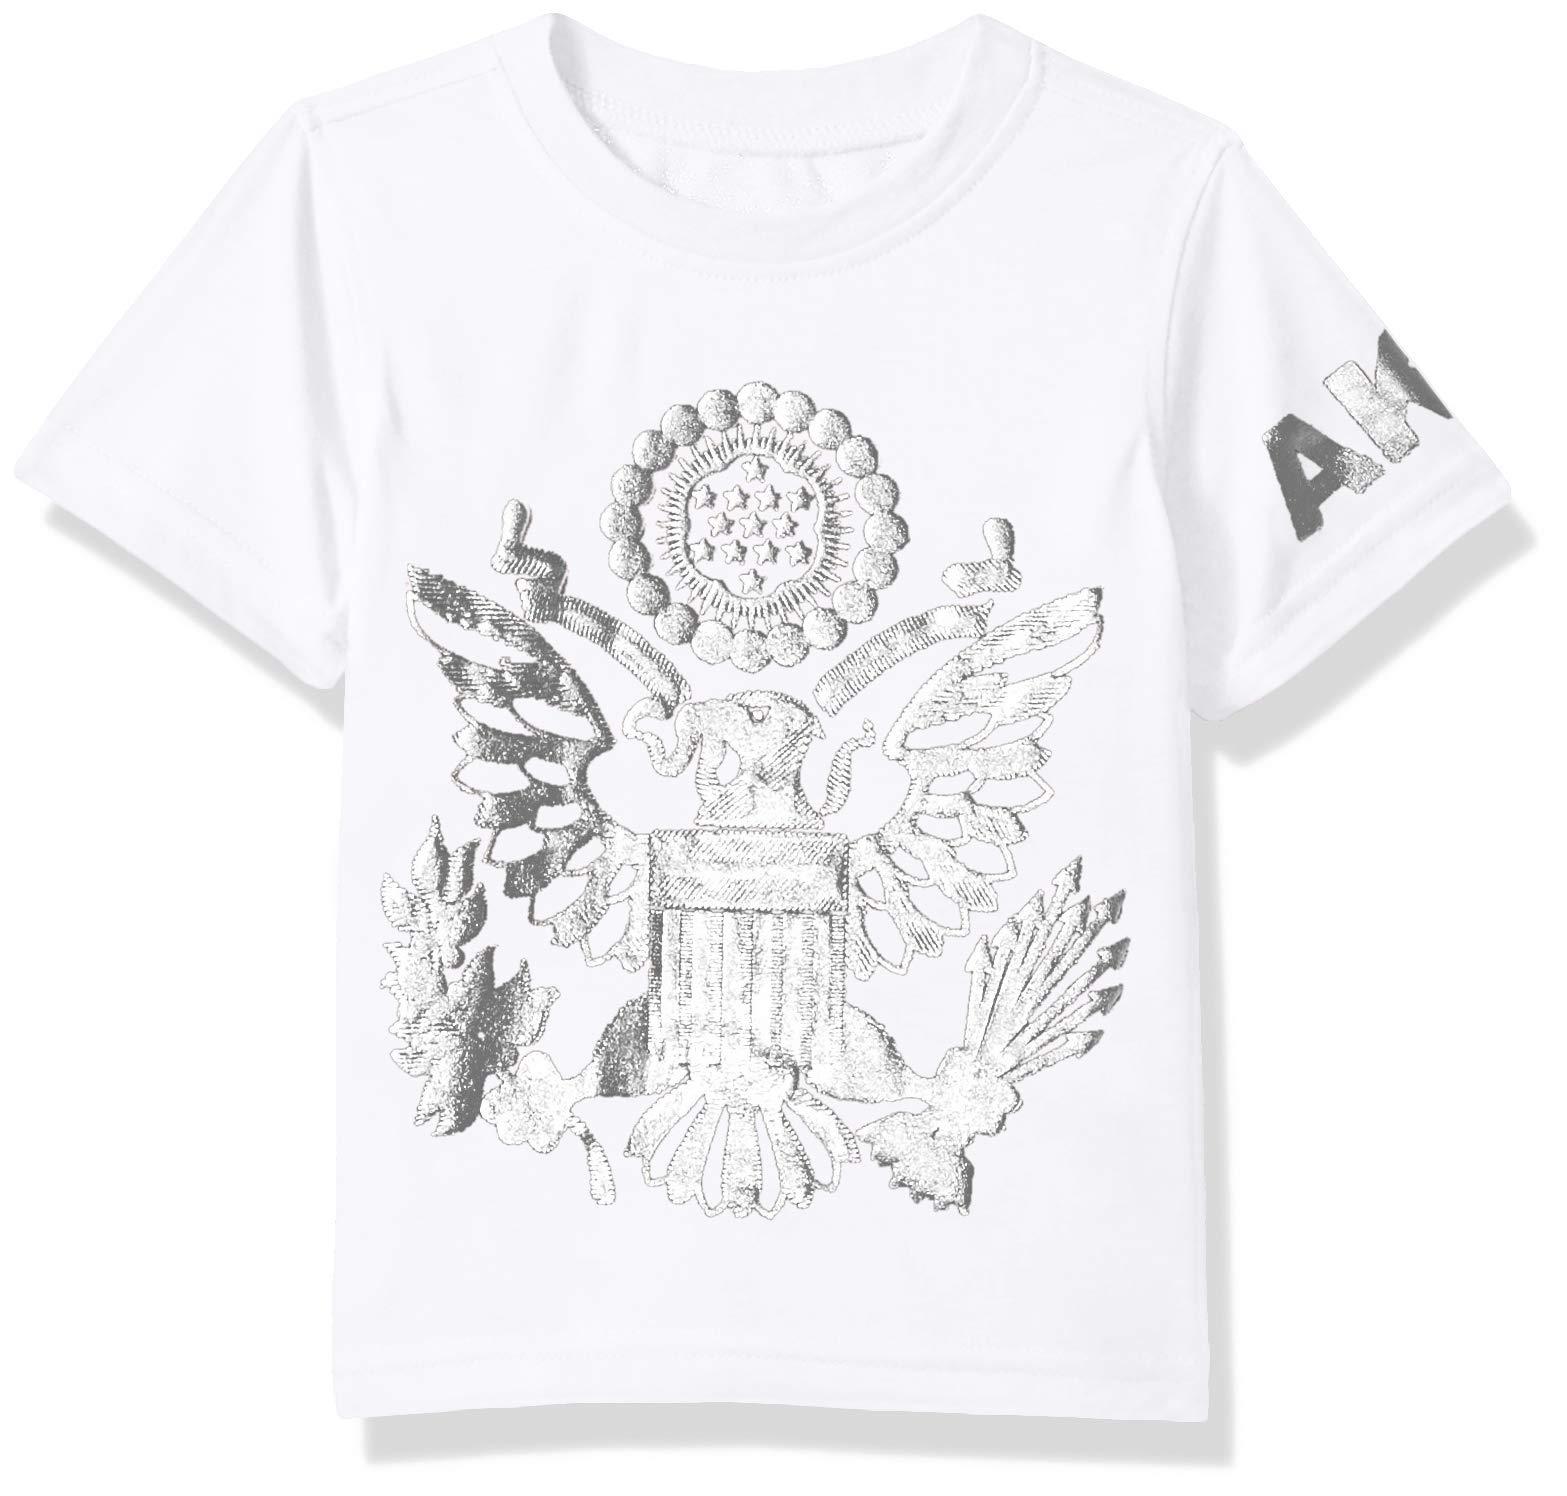 Akademiks Kids Boys' Toddler Short Sleeve Fashion Tee Shirt, Bird White 3T